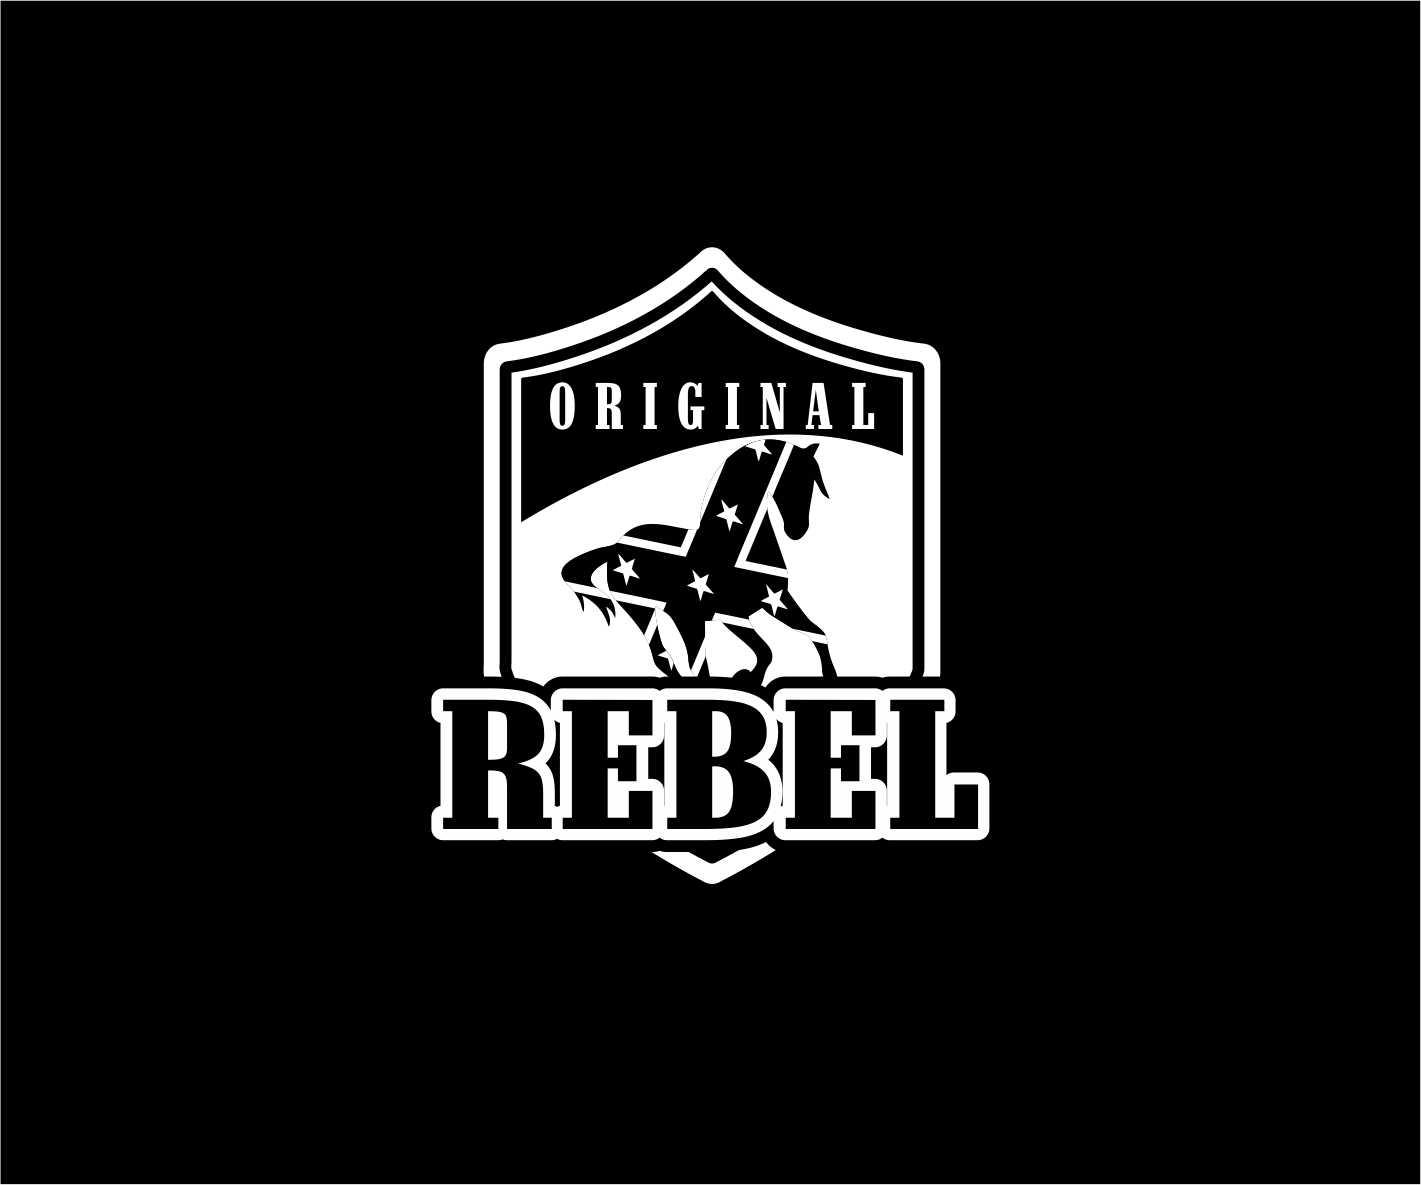 Logo Design by Private User - Entry No. 6 in the Logo Design Contest Creative Logo Design for Original Rebel.